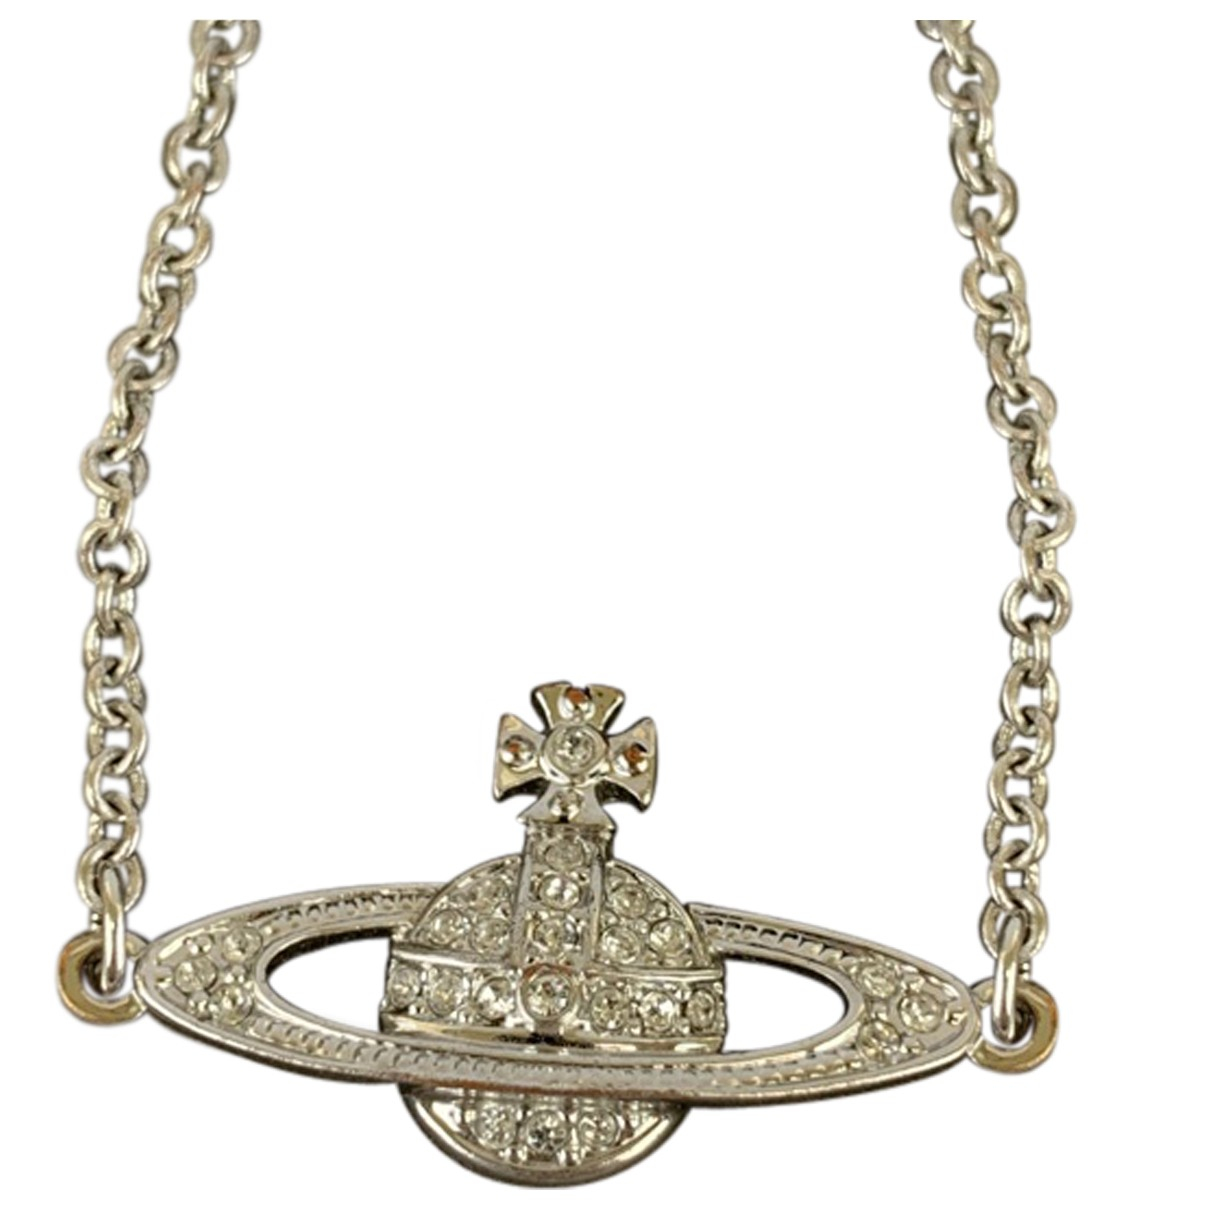 Vivienne Westwood N Silver Metal necklace for Women 18-20 UK